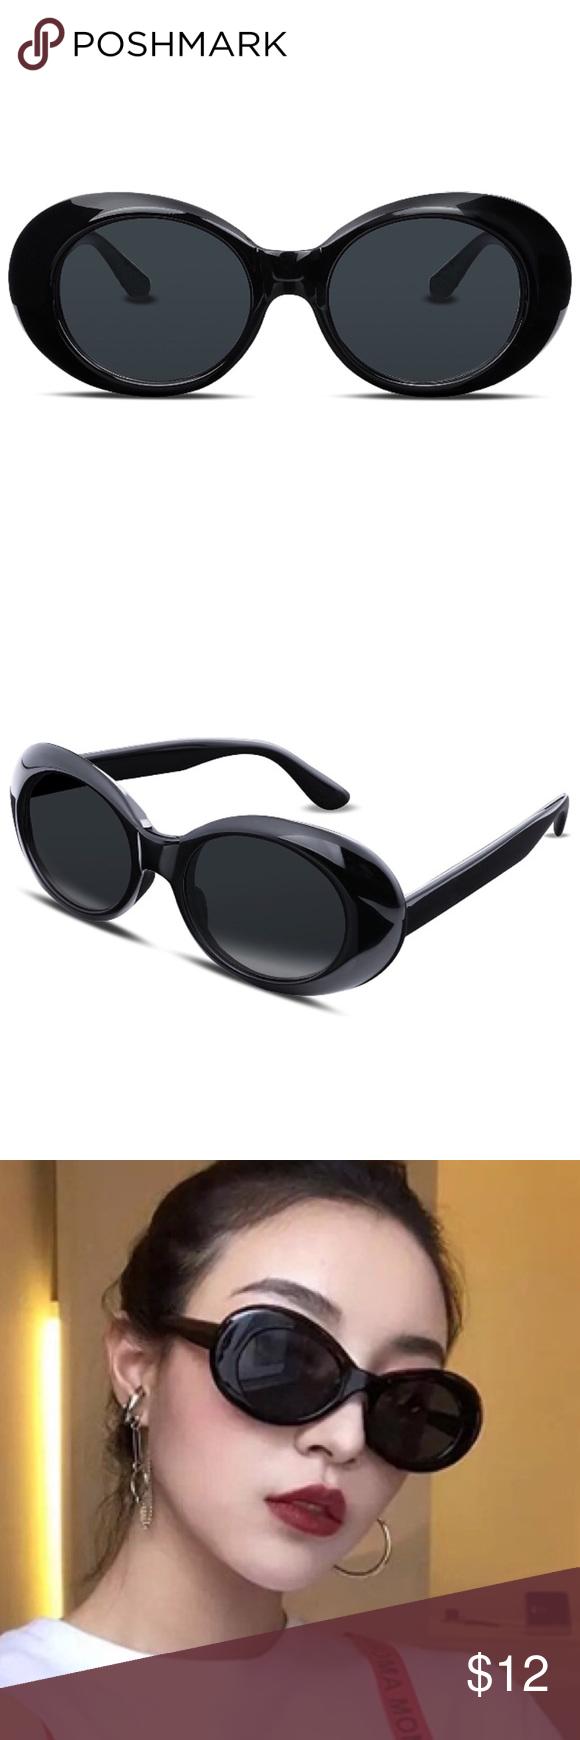 1e061d148833 Jackie O. Black Sunglasses Oversized Clout Goggles Super stylish Kurt  Cobain Sunglasses 😎 black frames with dark gray lenses. Retro 90s Grunge  by way of ...